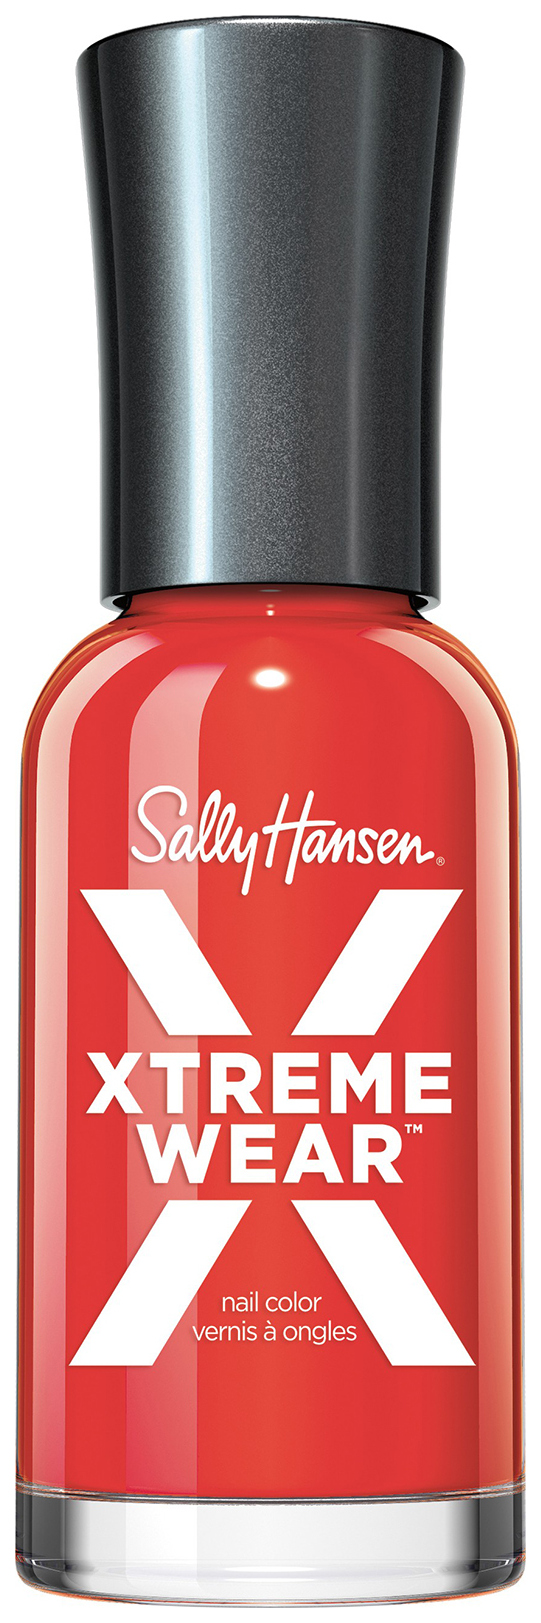 Купить Лак для ногтей Sally Hansen Xtreme Wear Nail Color 303 Selfie Red-y 11, 8 мл